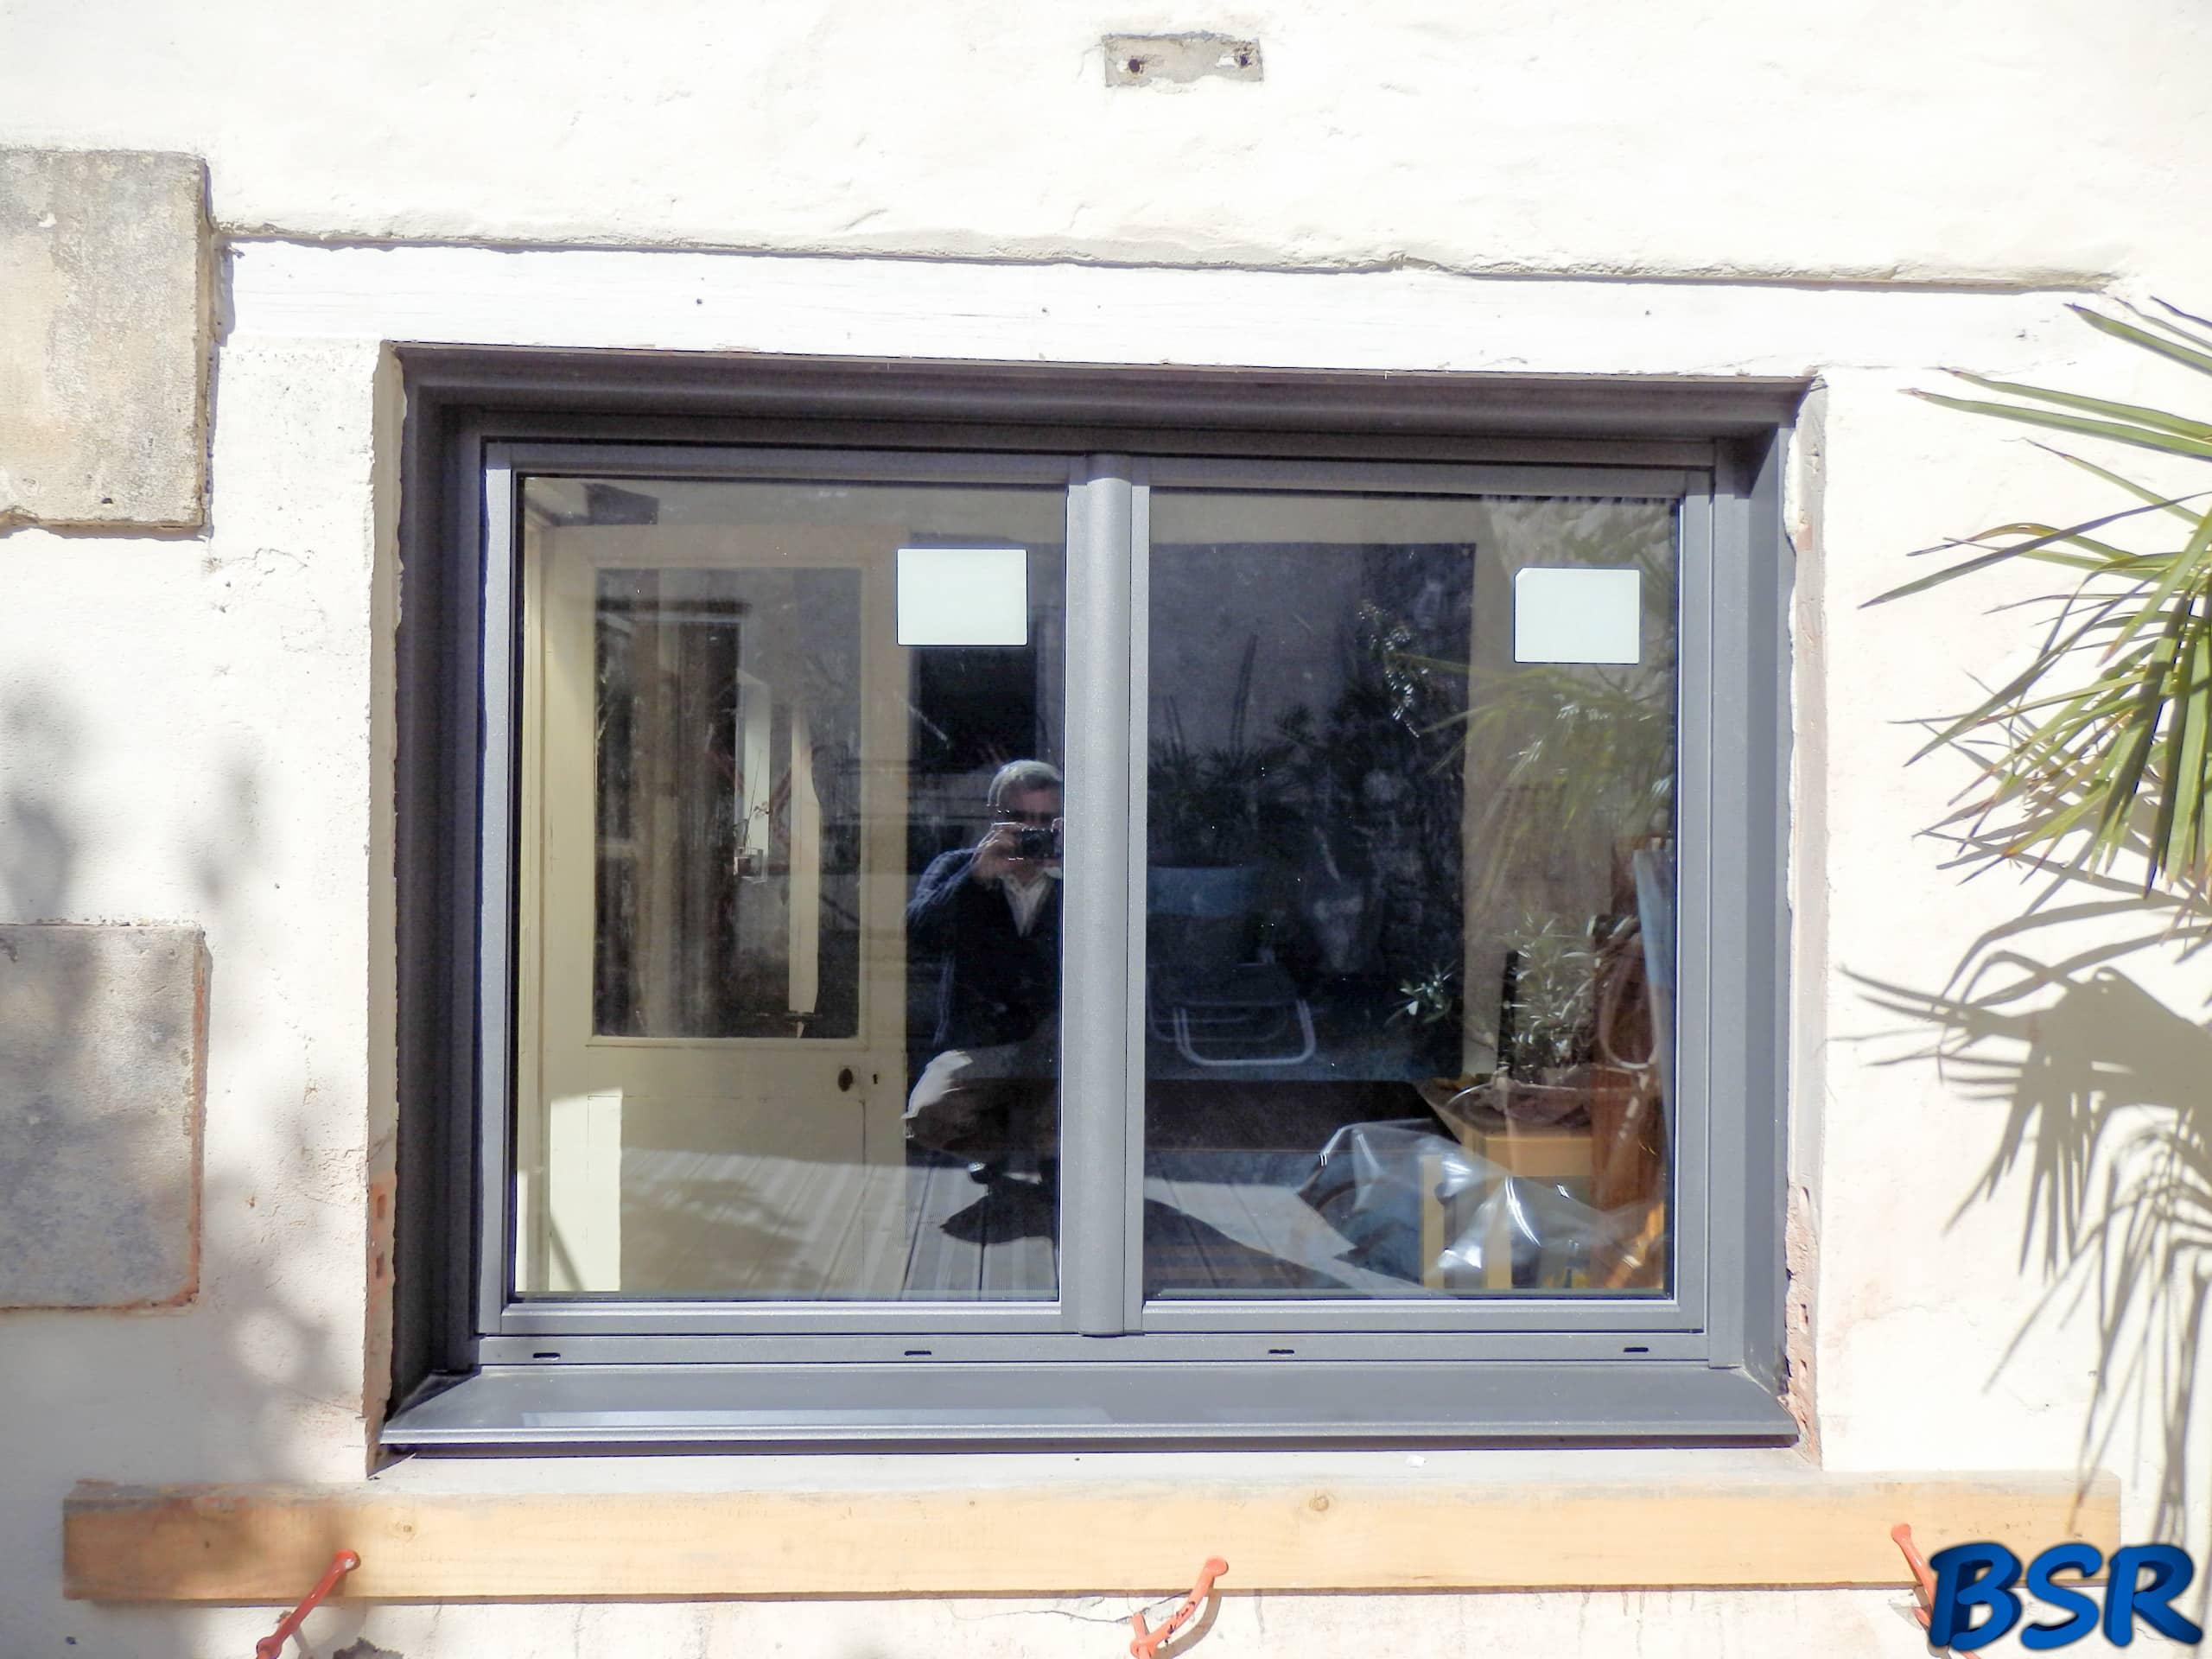 Porte et fenêtre Aluminium BSR 005